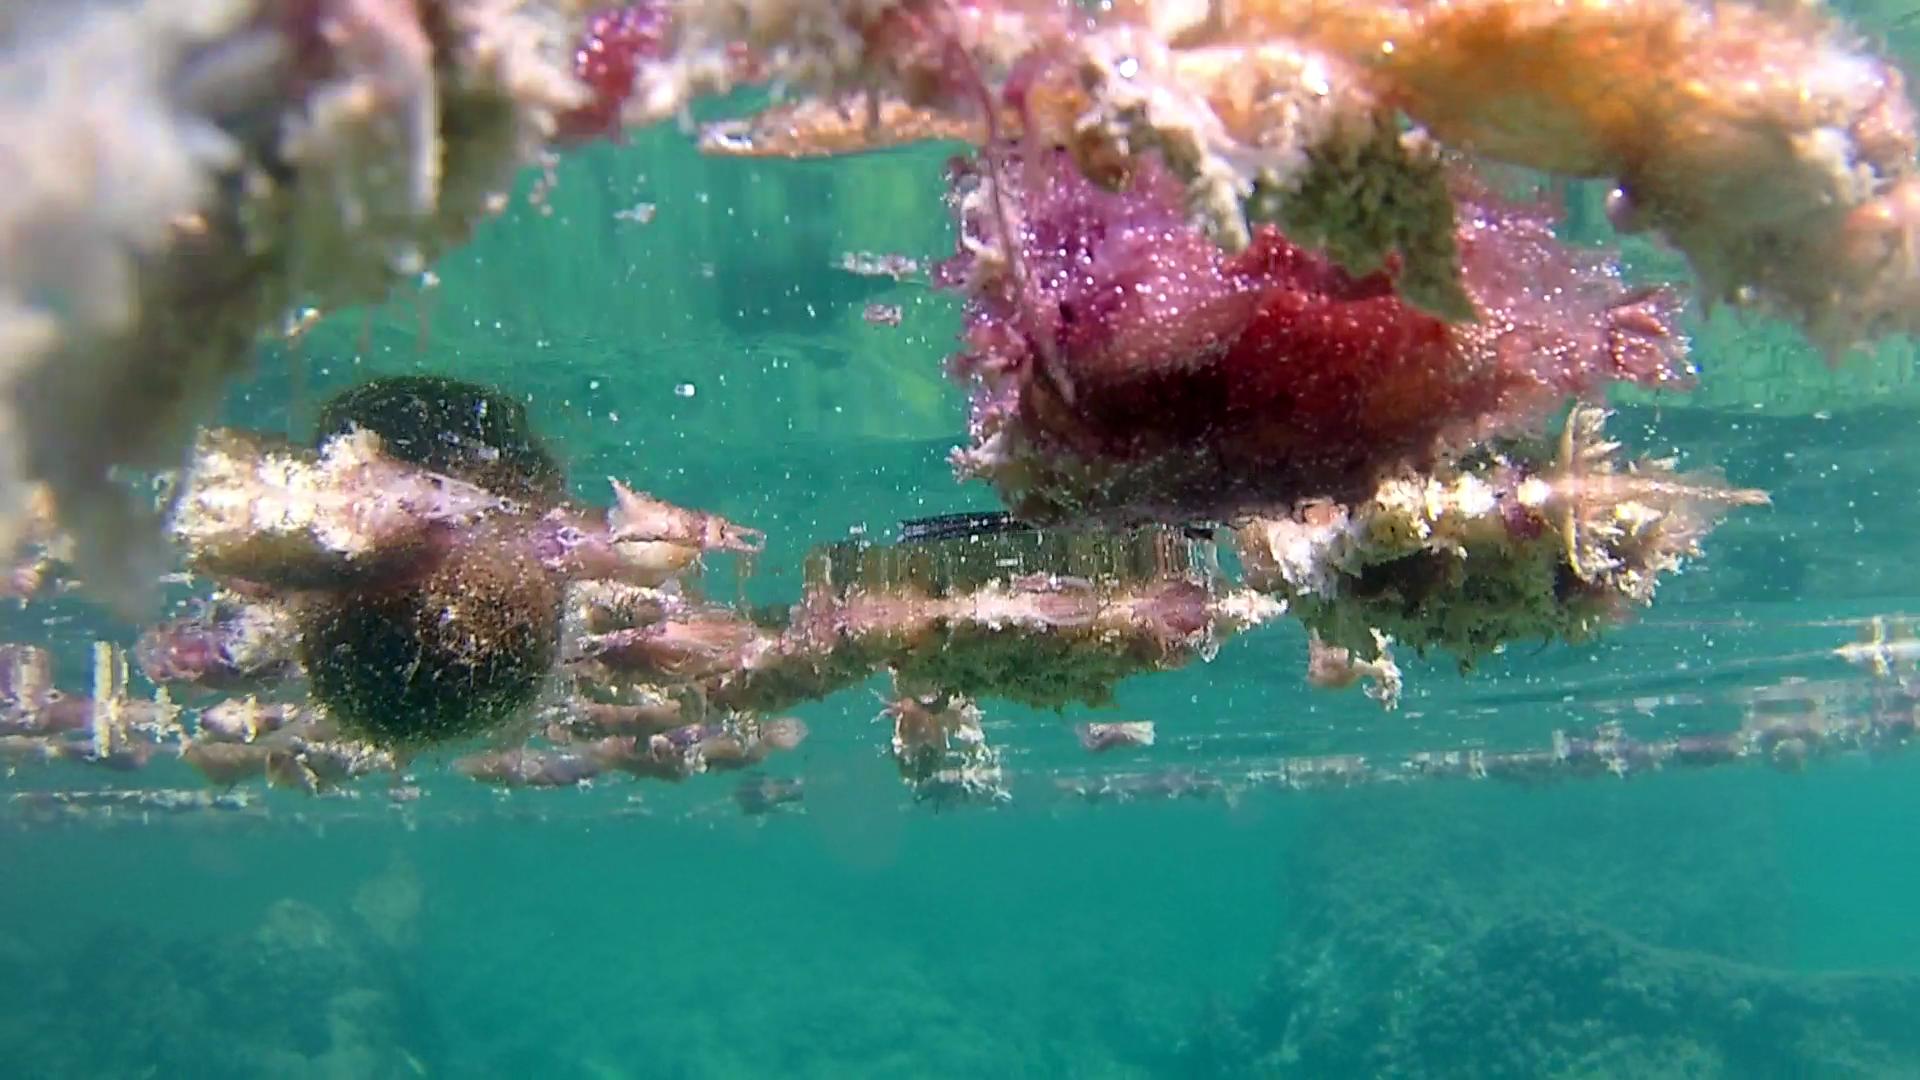 Mucillagine causata da riscaldamento marino -Mucilage caused by marine heating - intotheblue.it